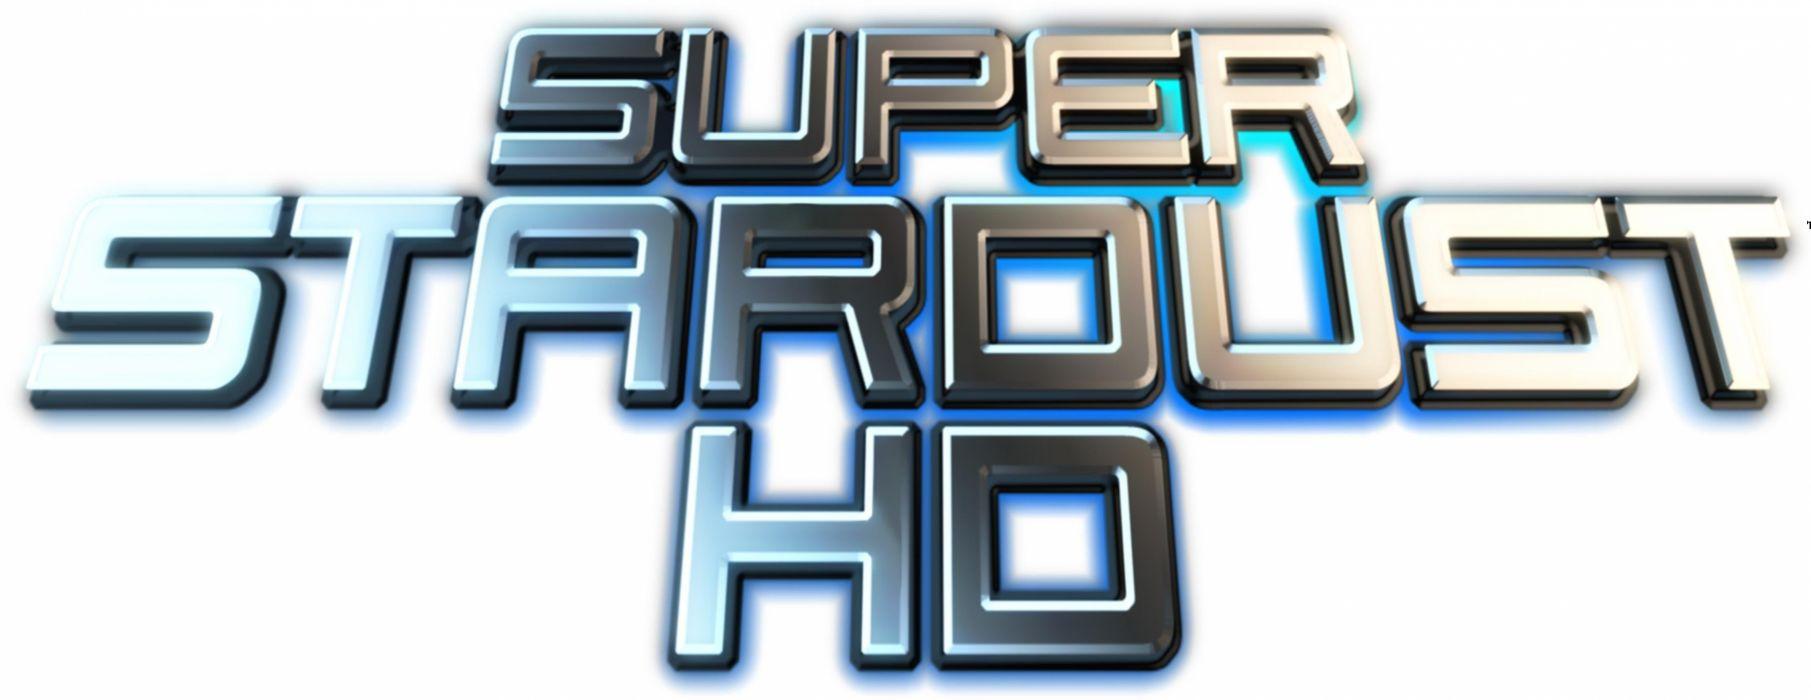 SUPER STARDUST shooter sci-fi action futuristic wallpaper